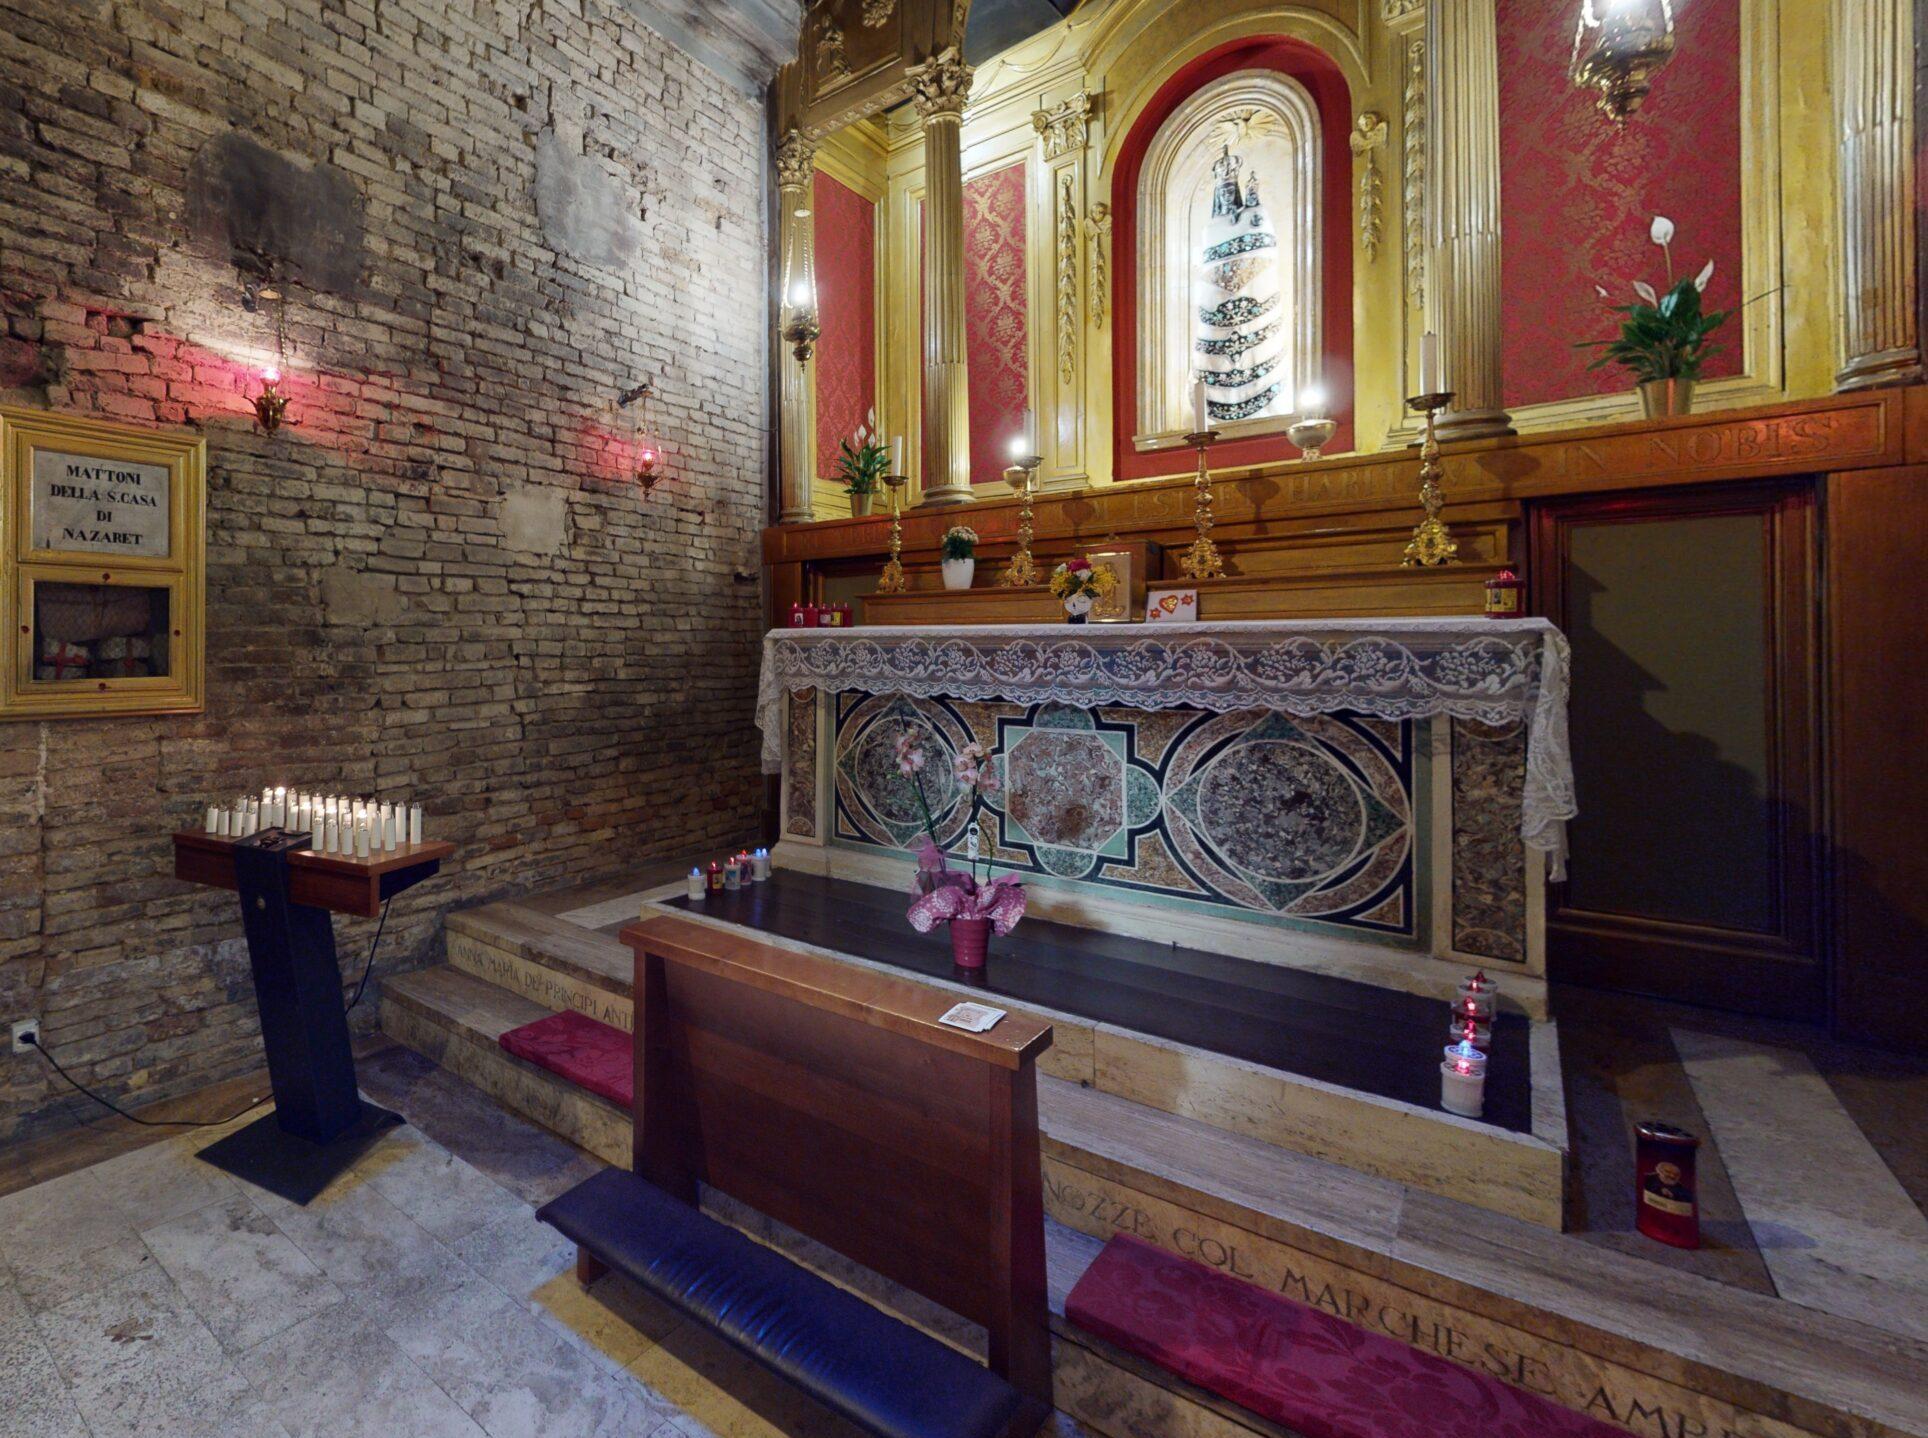 Chiesa-SantAnna-Recanati-Photo-5